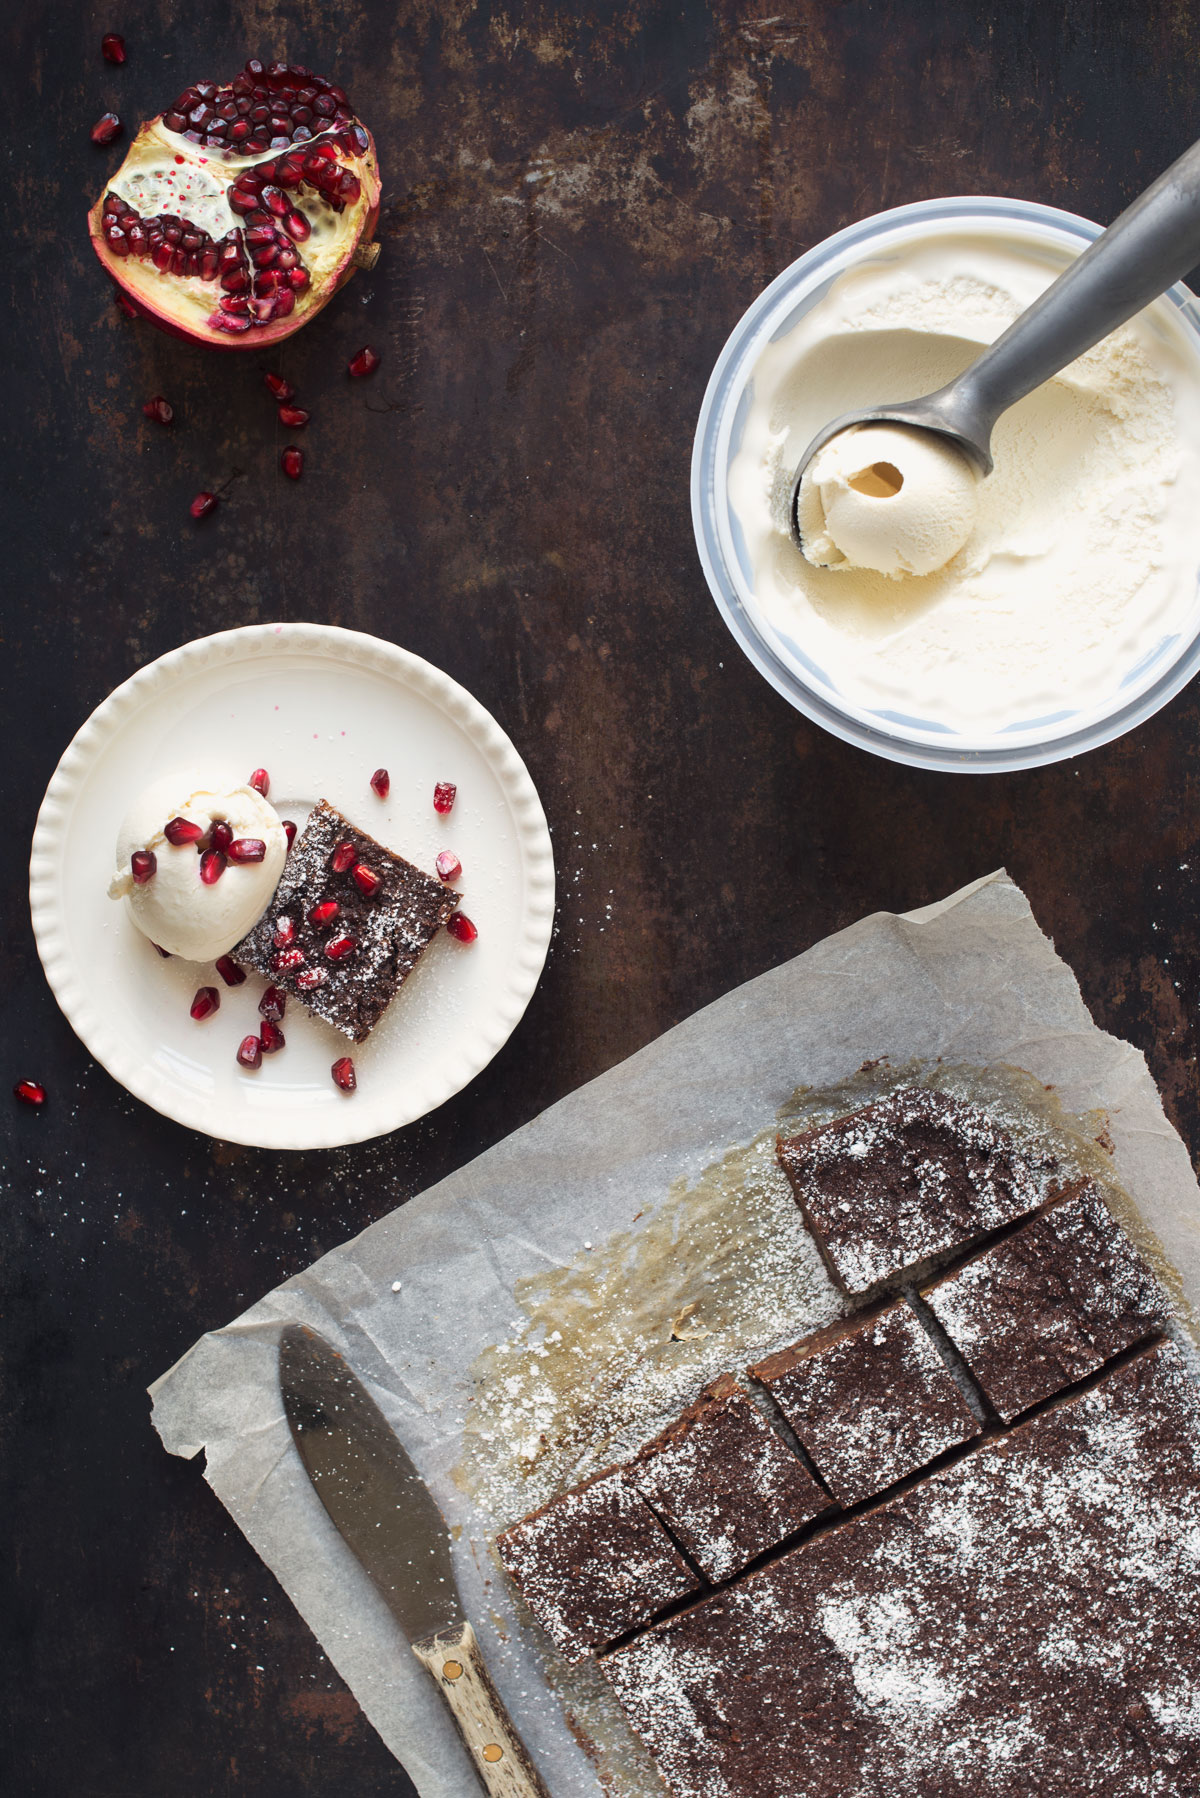 Opskrift: Vegansk brownie/chokoladekag | Frk. Kræsen